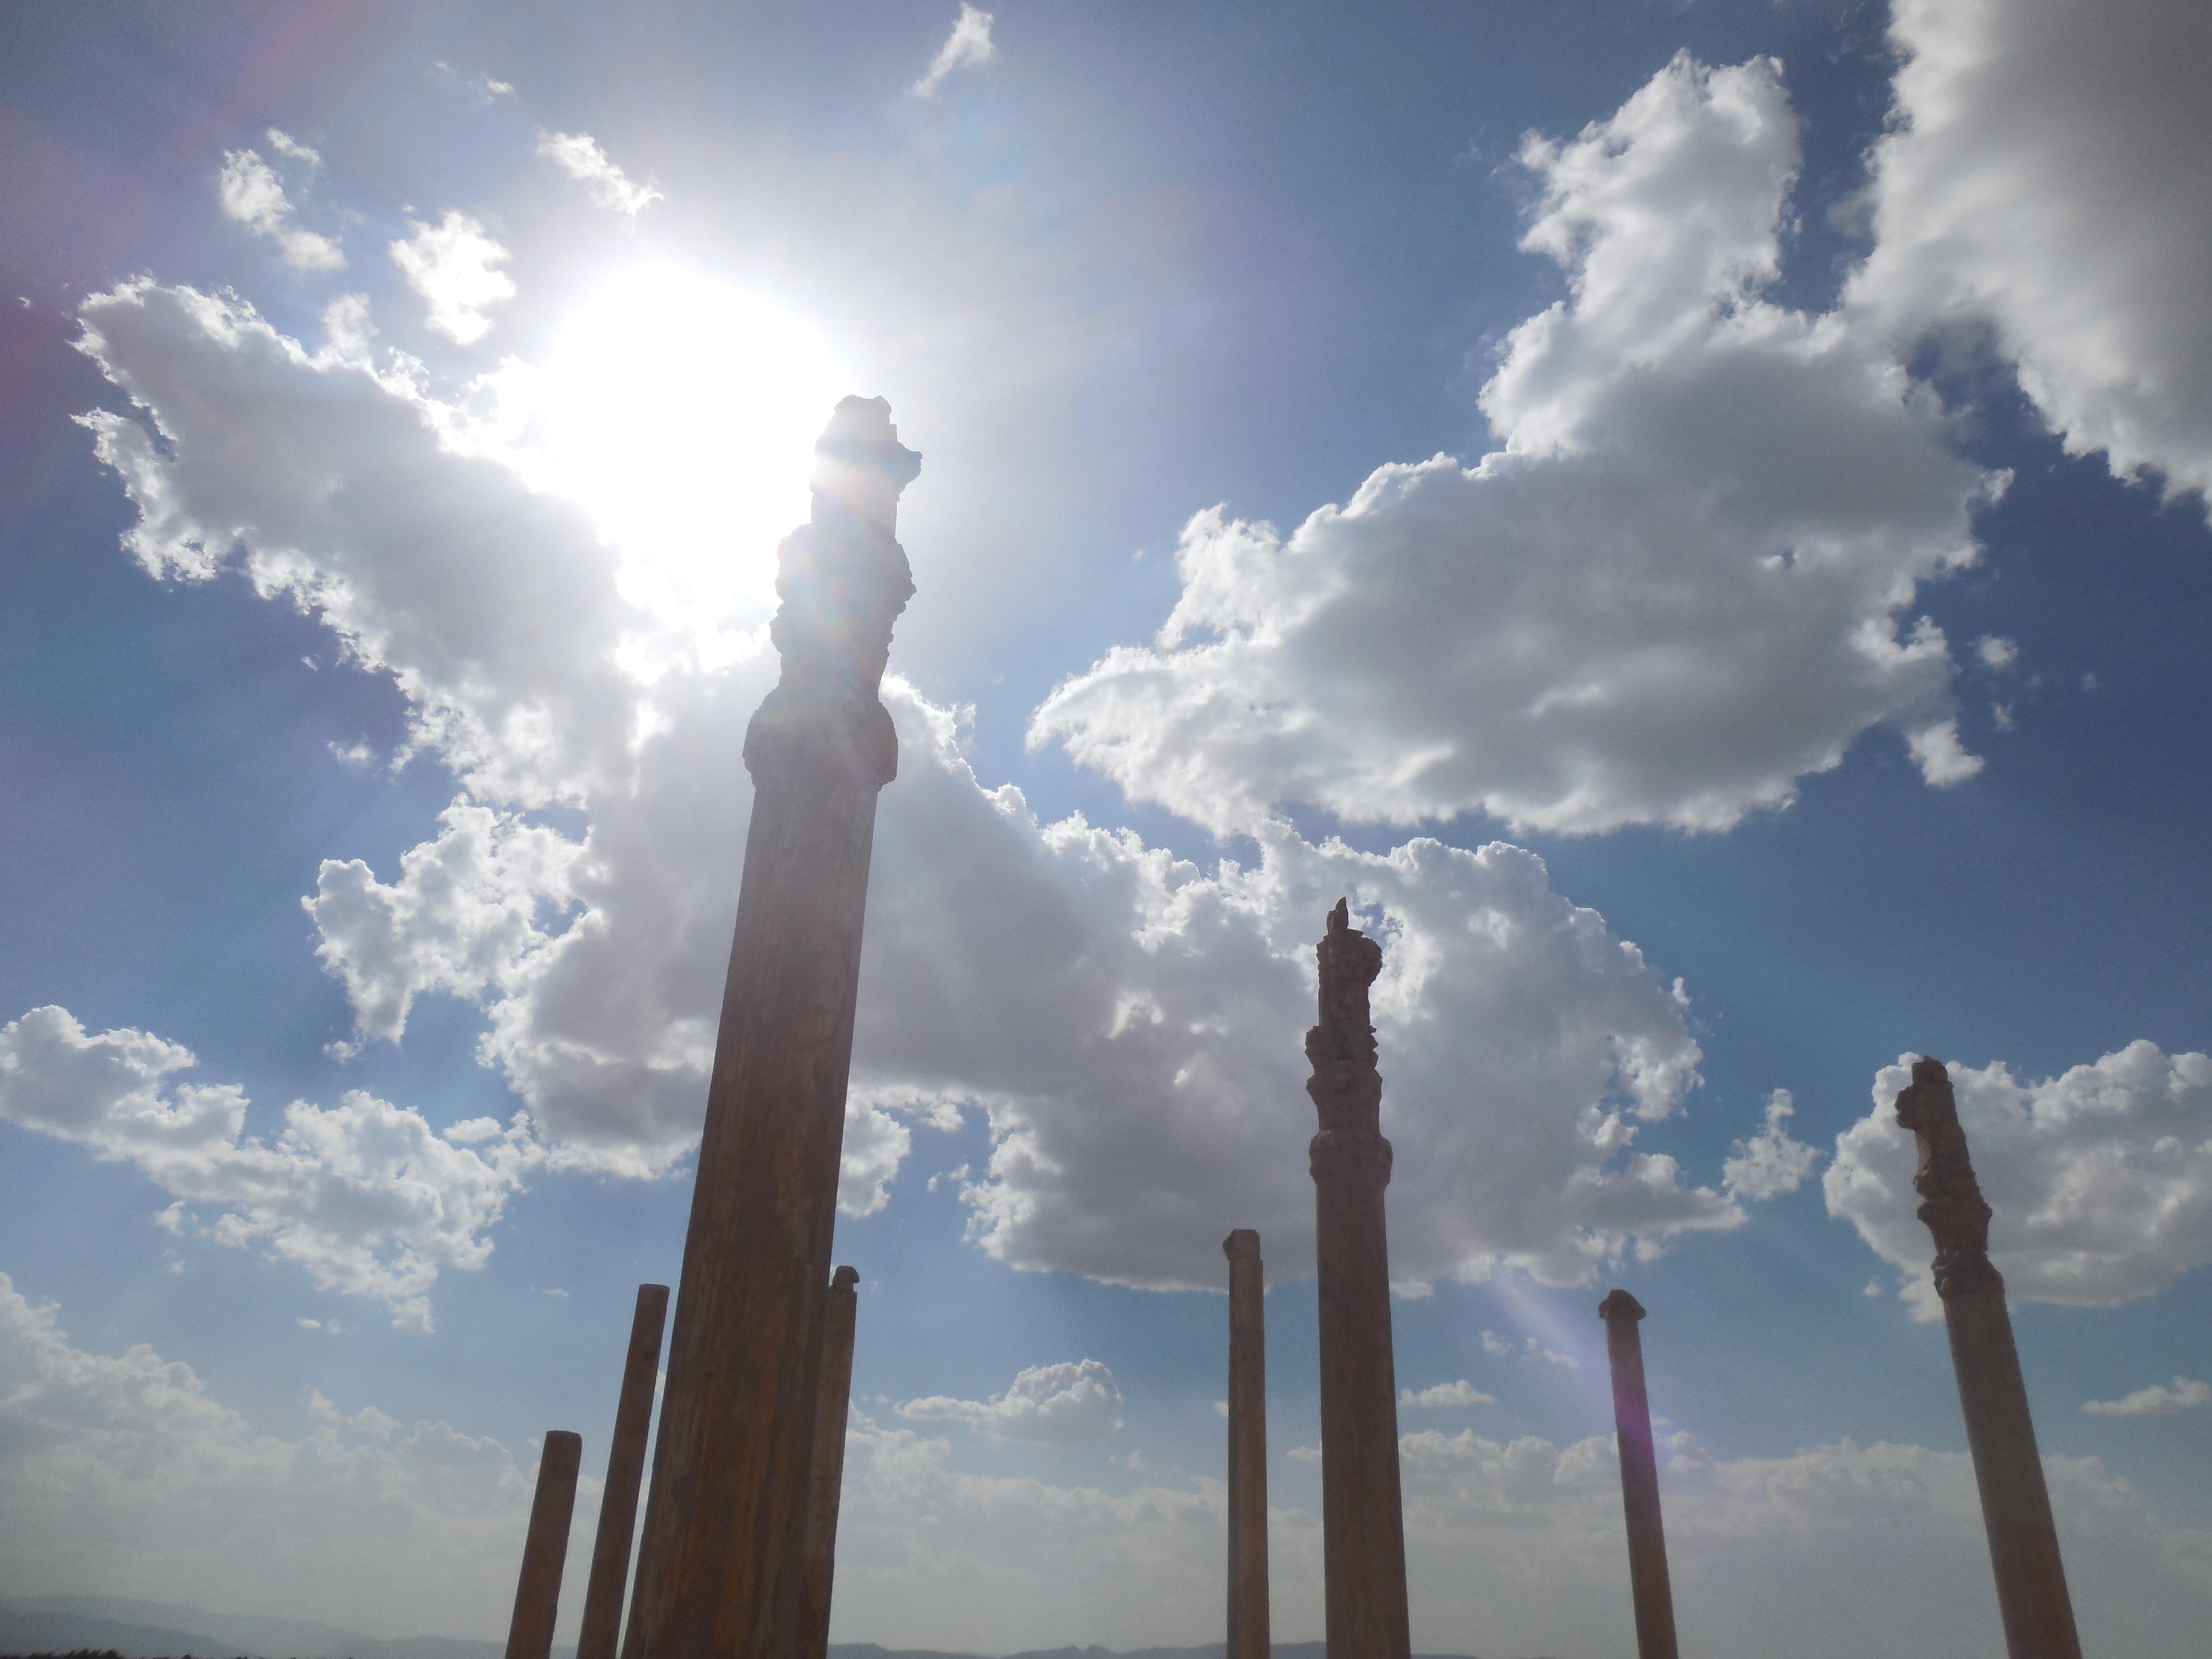 Persepolis Iran Reise Erfahrung Blog Eintritt